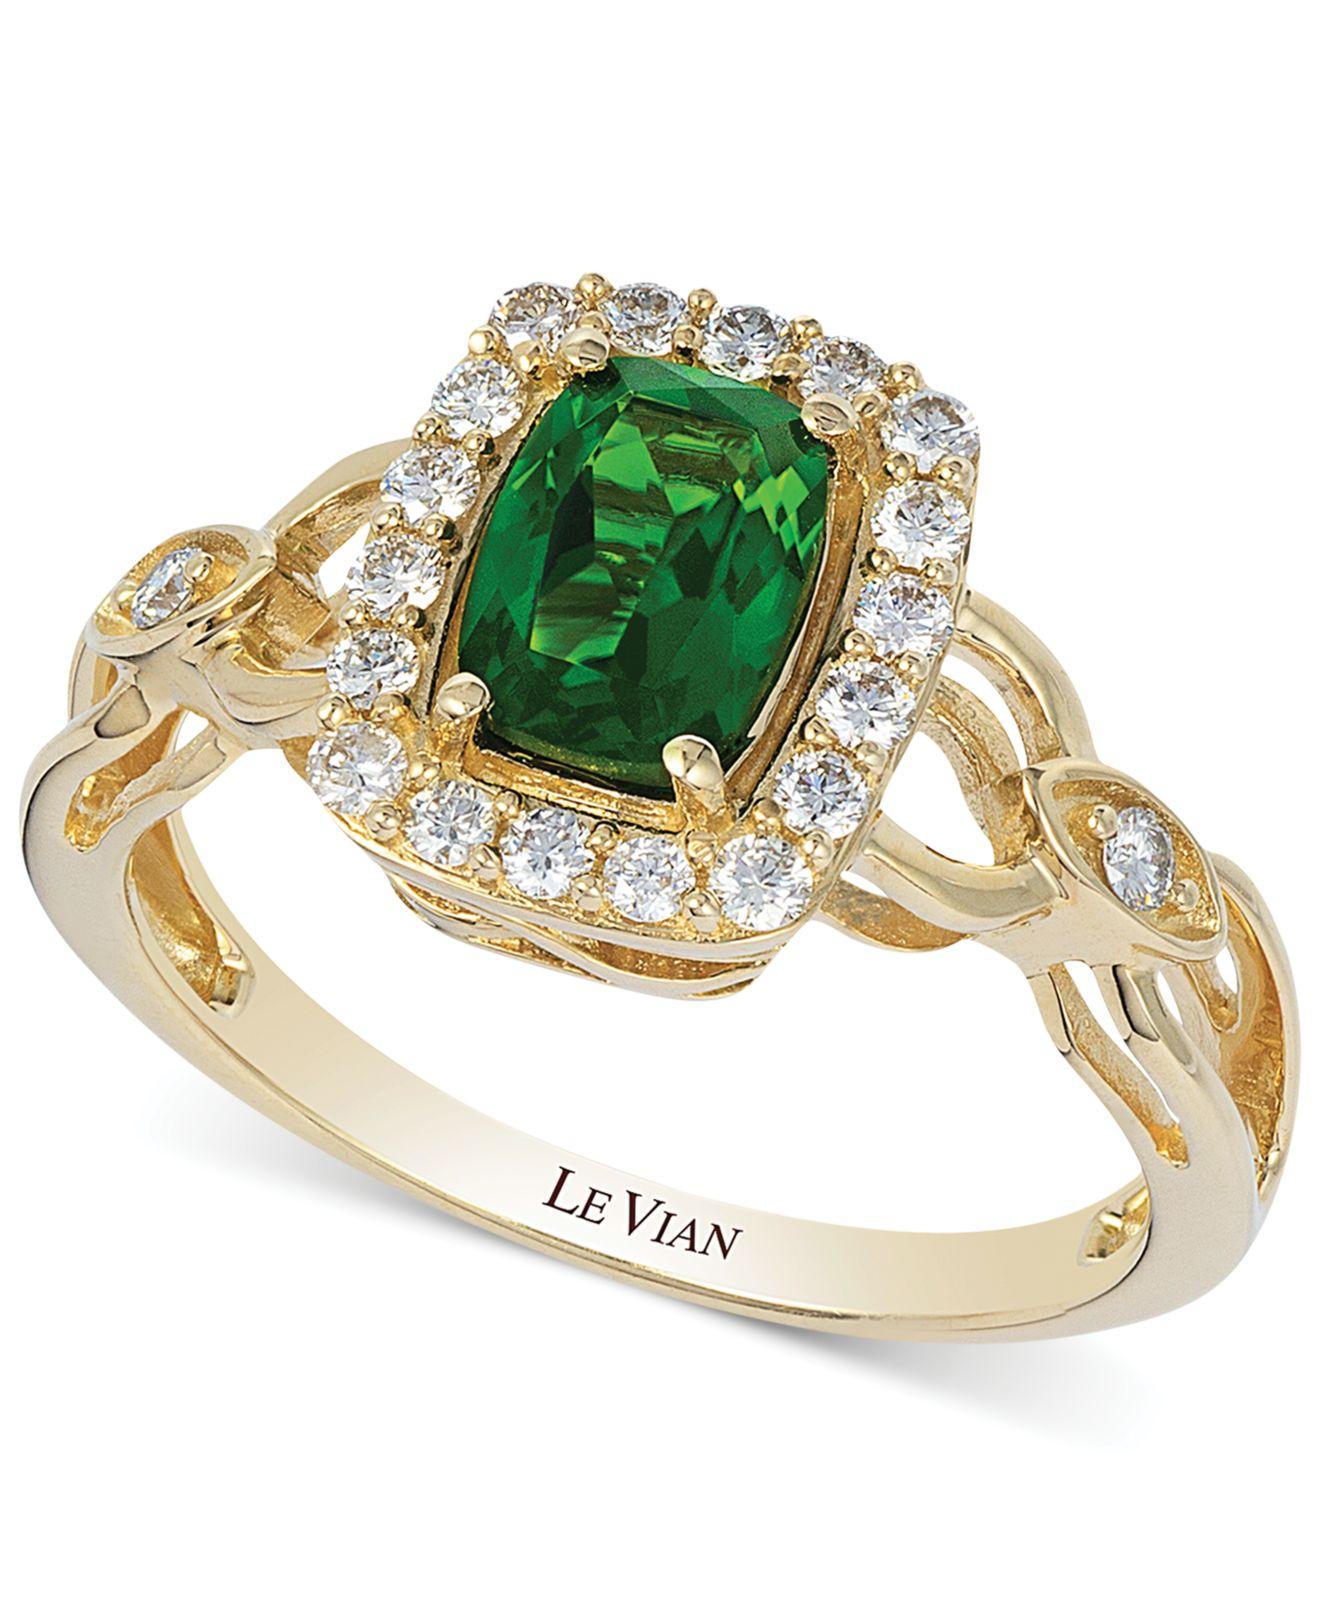 Custom Sized Rings